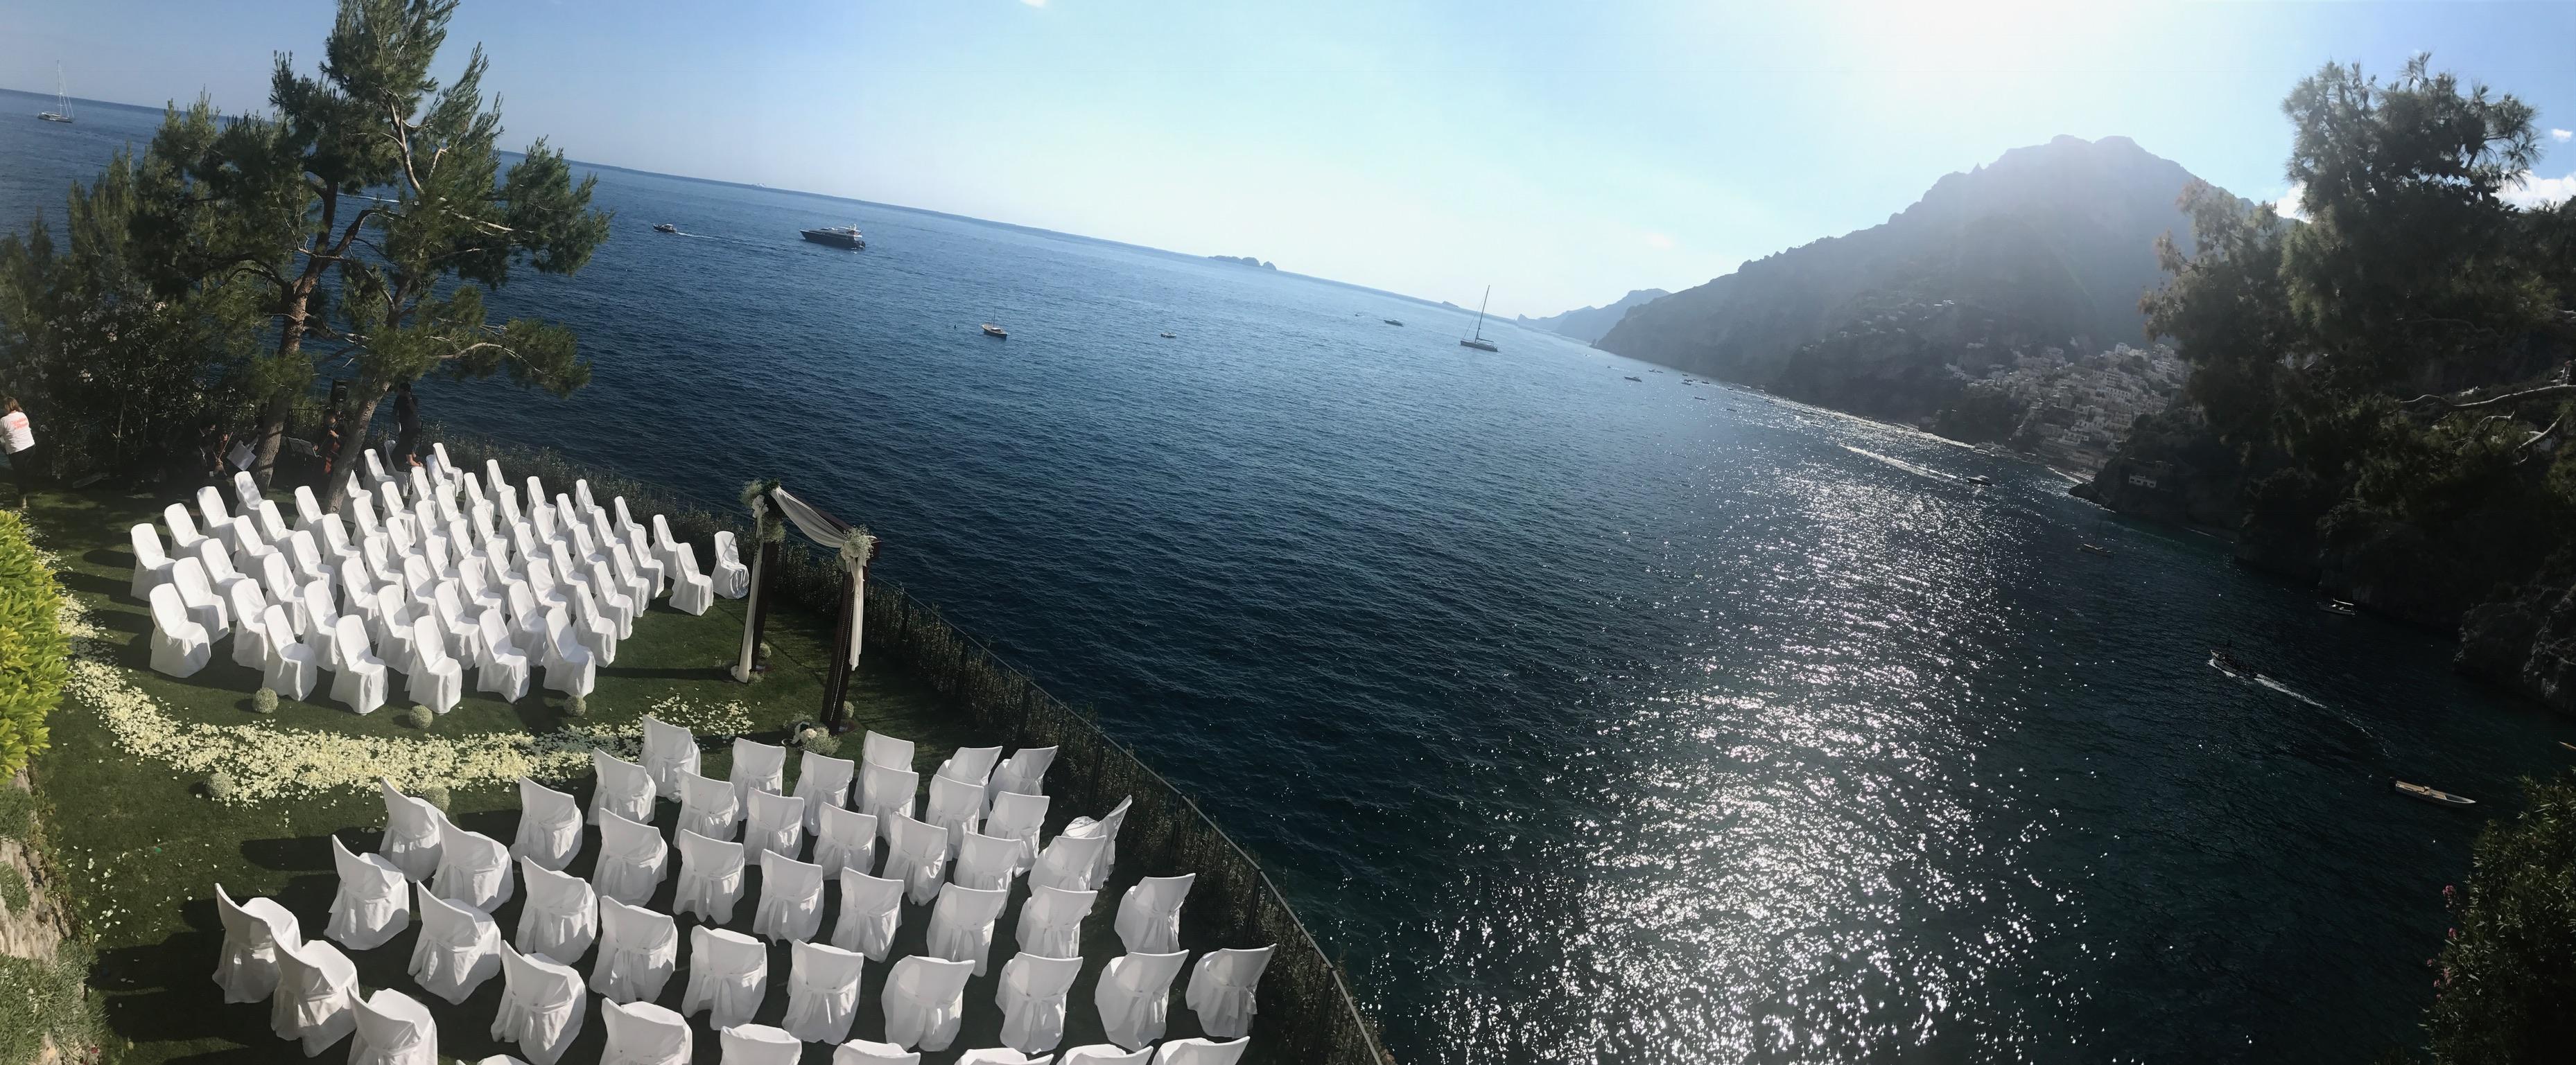 https://www.weddingamalfi.com/wp-content/uploads/Day-3-seaside-wedding-ceremony.jpg